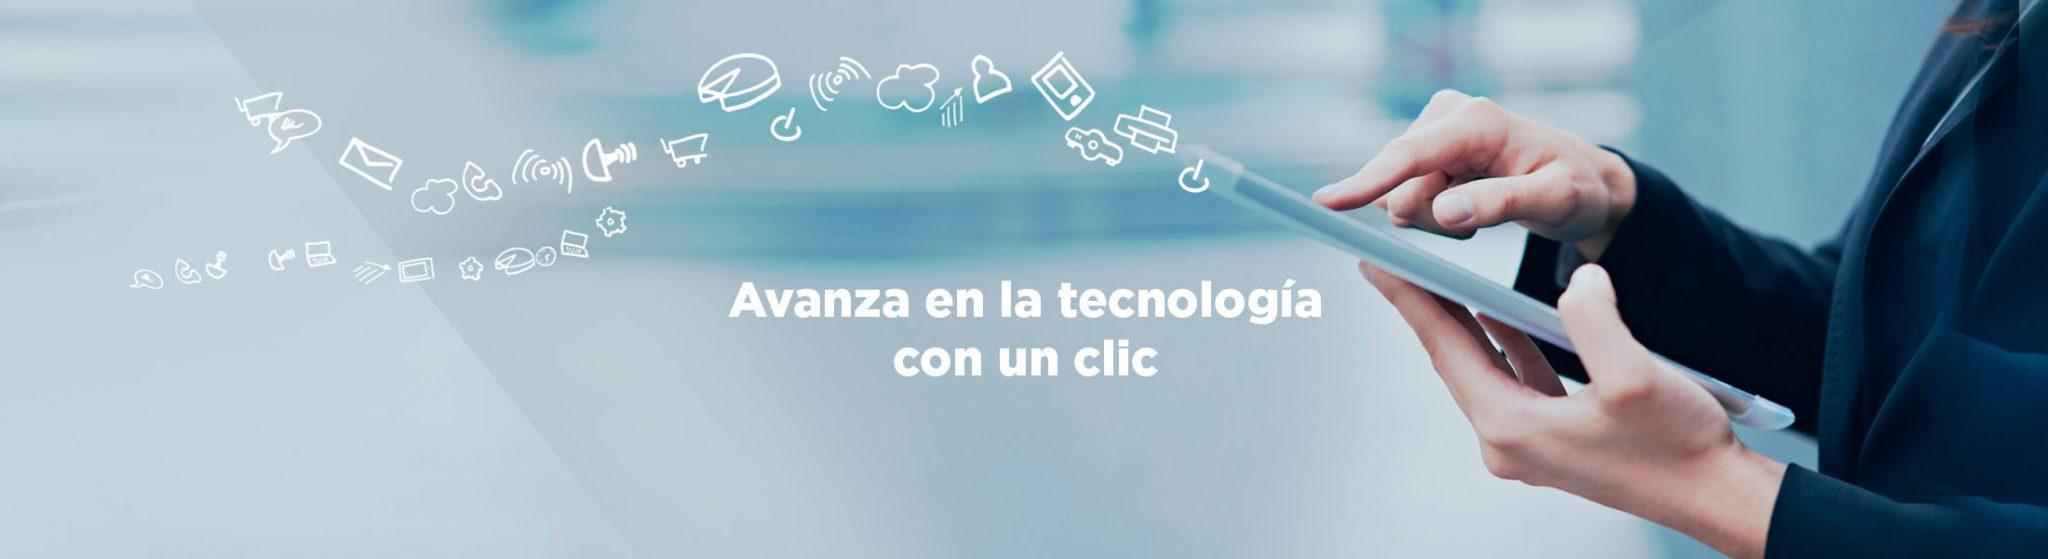 hermes_interactiva_slide_inicio04